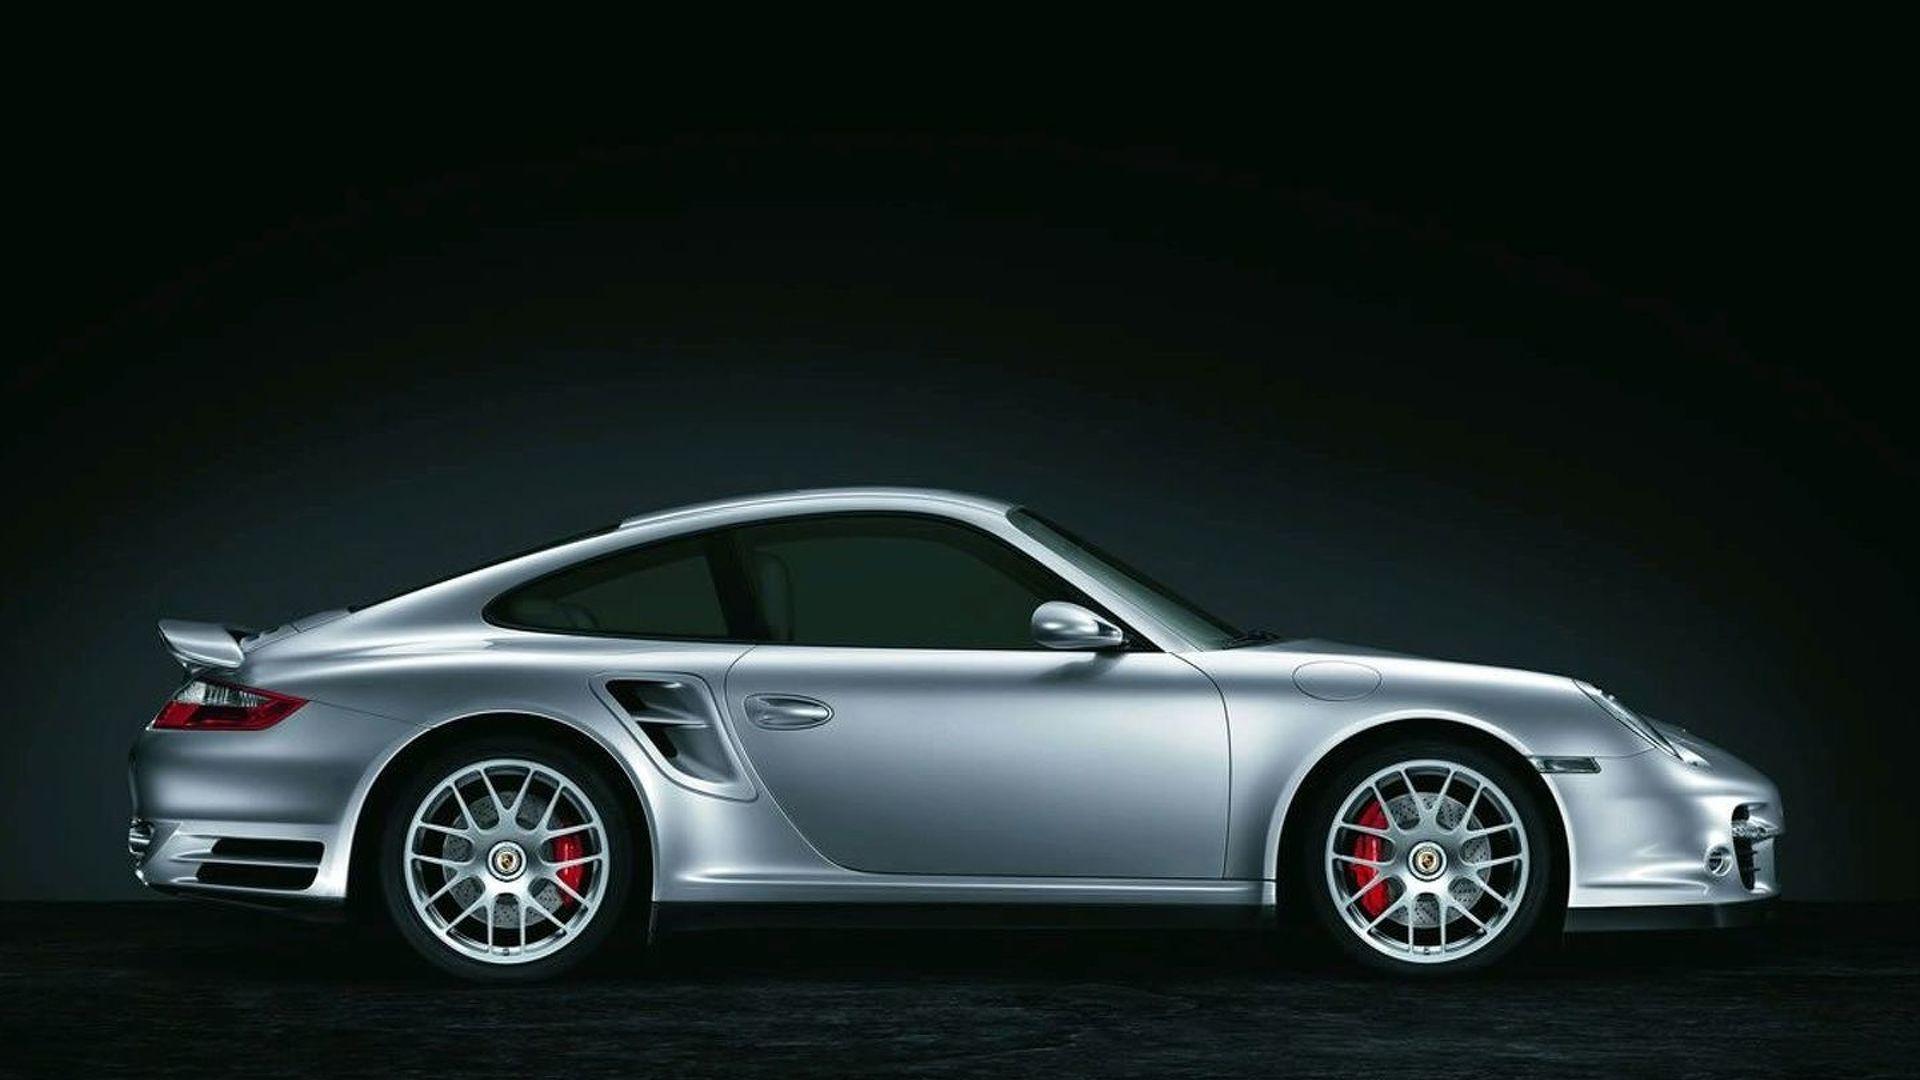 New Porsche RS Spyder Design Wheels with Central Locking Announced